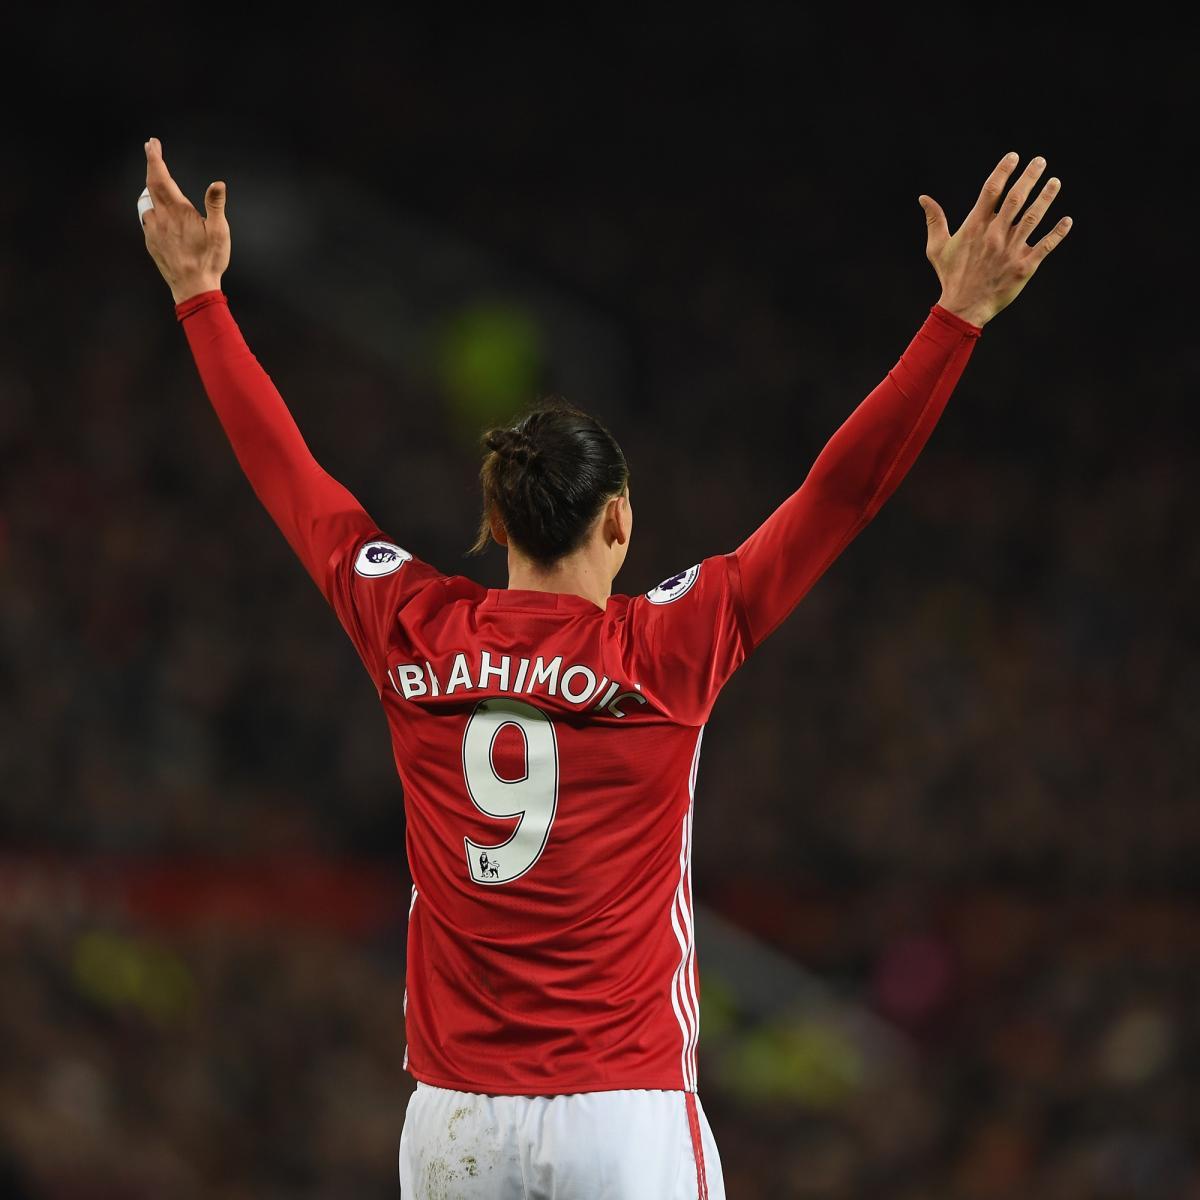 Reimagining Manchester United Legends as Superheroes